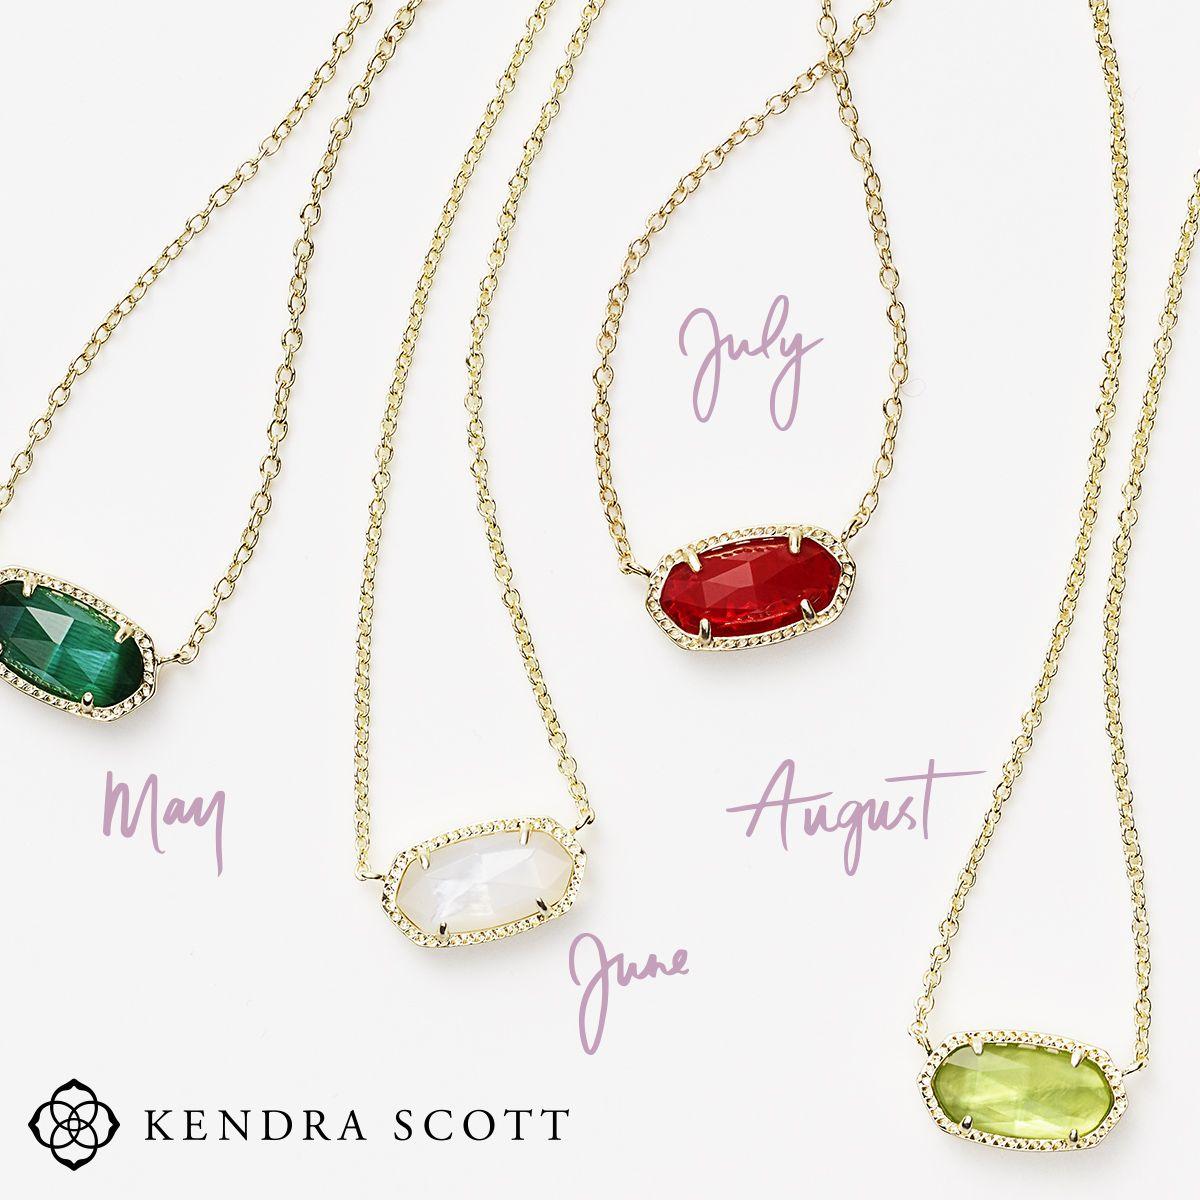 Sneak Peek Check Out These Gorgeous Kendra Scott